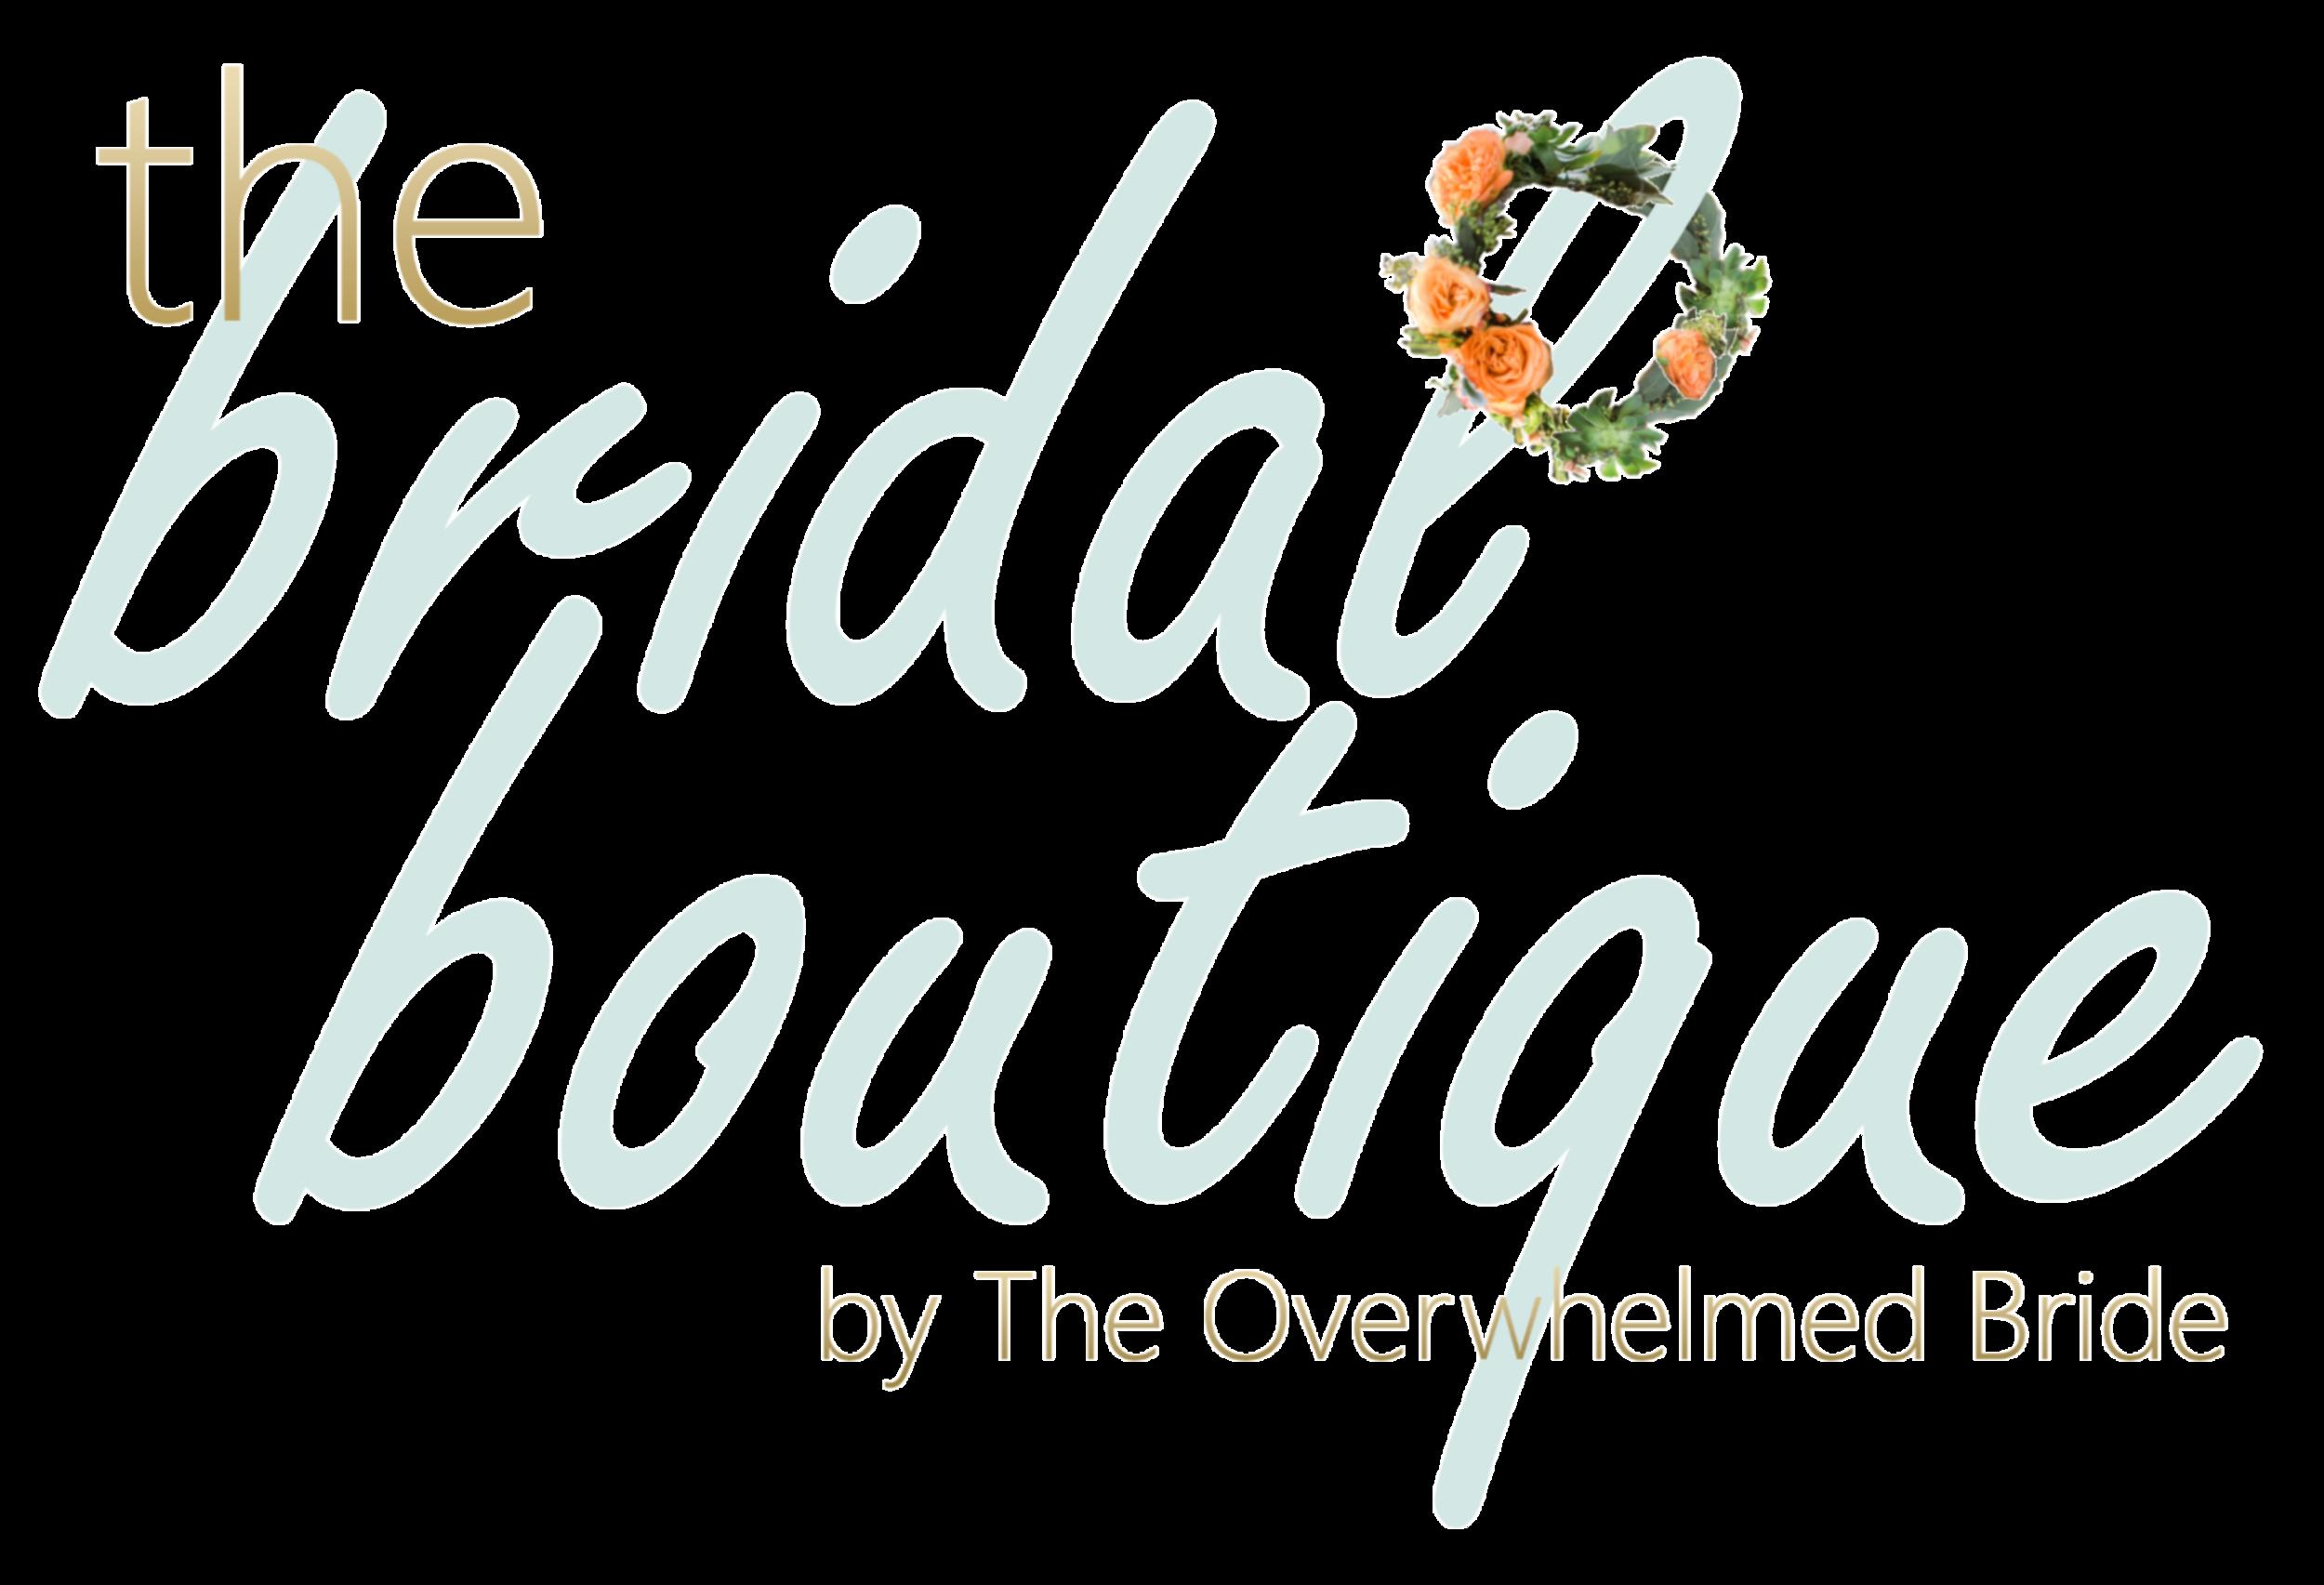 The Overwhelmed Bride Bridal Boutique // Something Treasured Amanda Belt